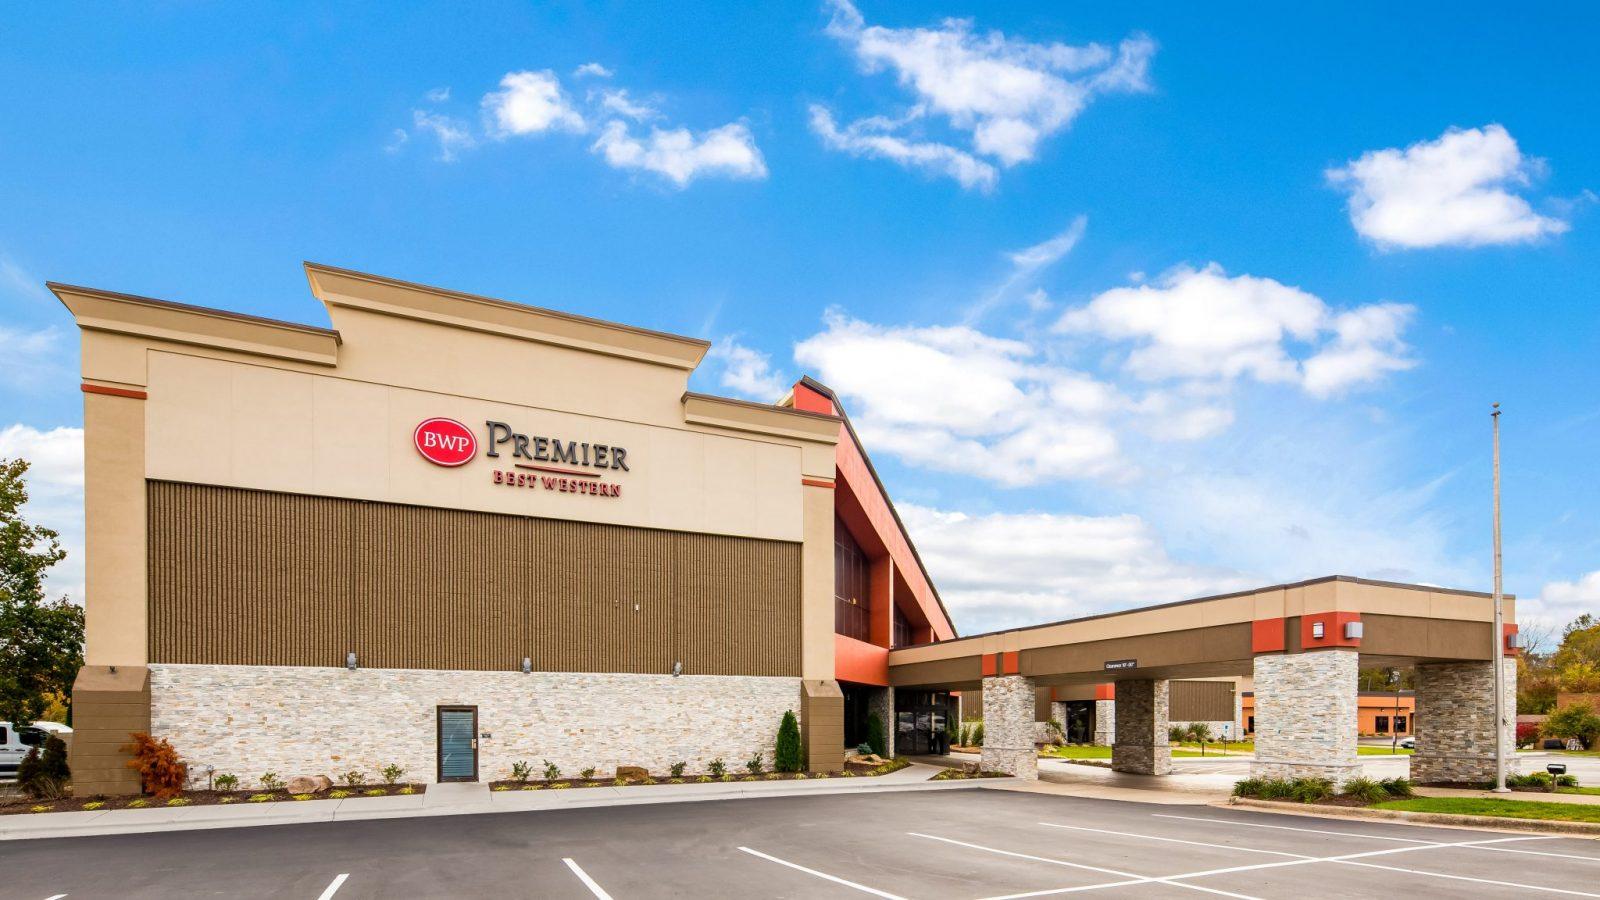 Best Western Premier Alton St. Louis Area